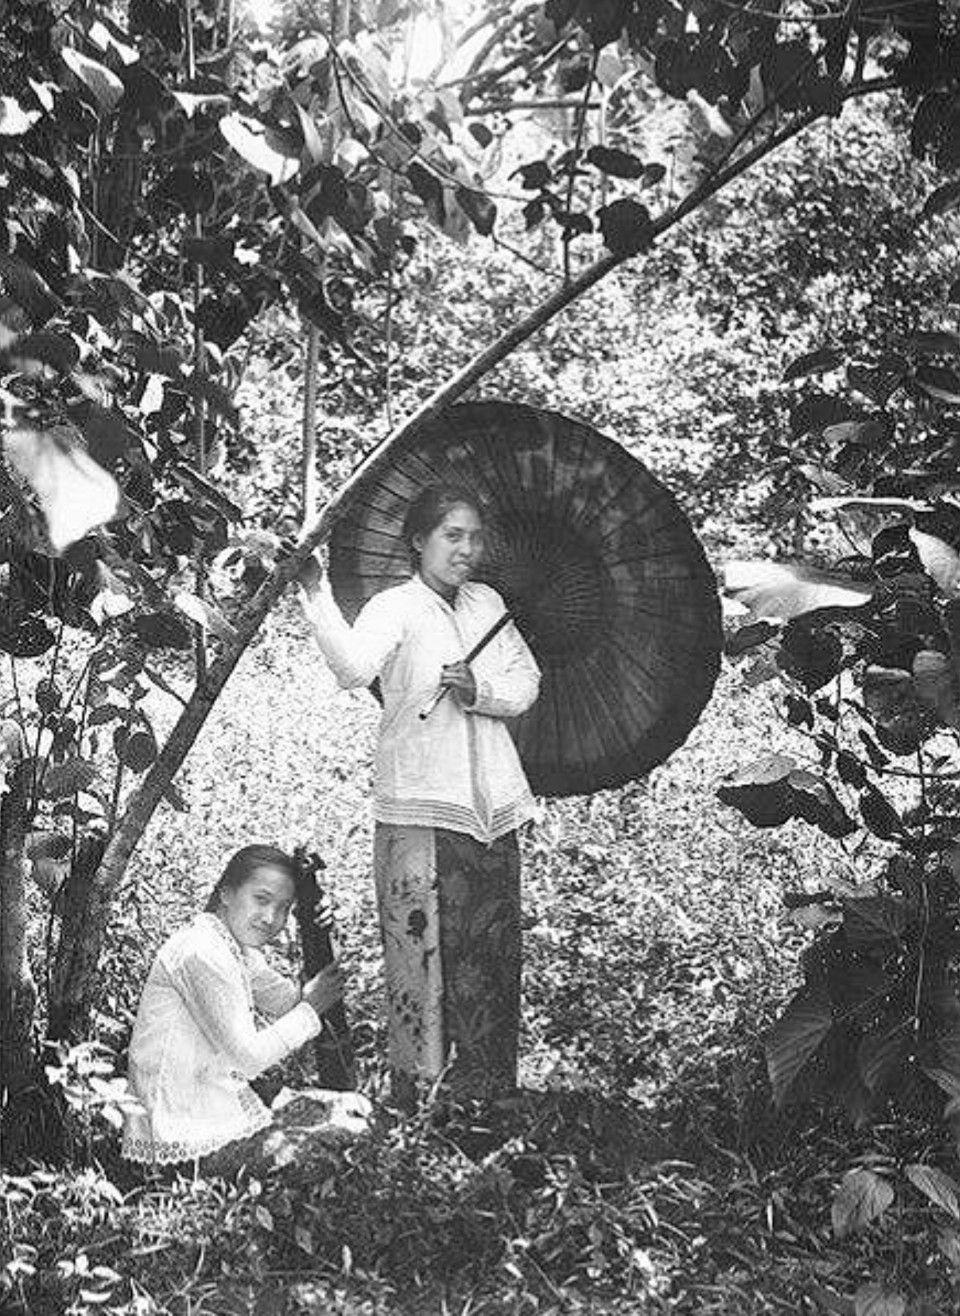 Dua wanita minahasa, Ca;1900 Sejarah, Wanita, Kucing